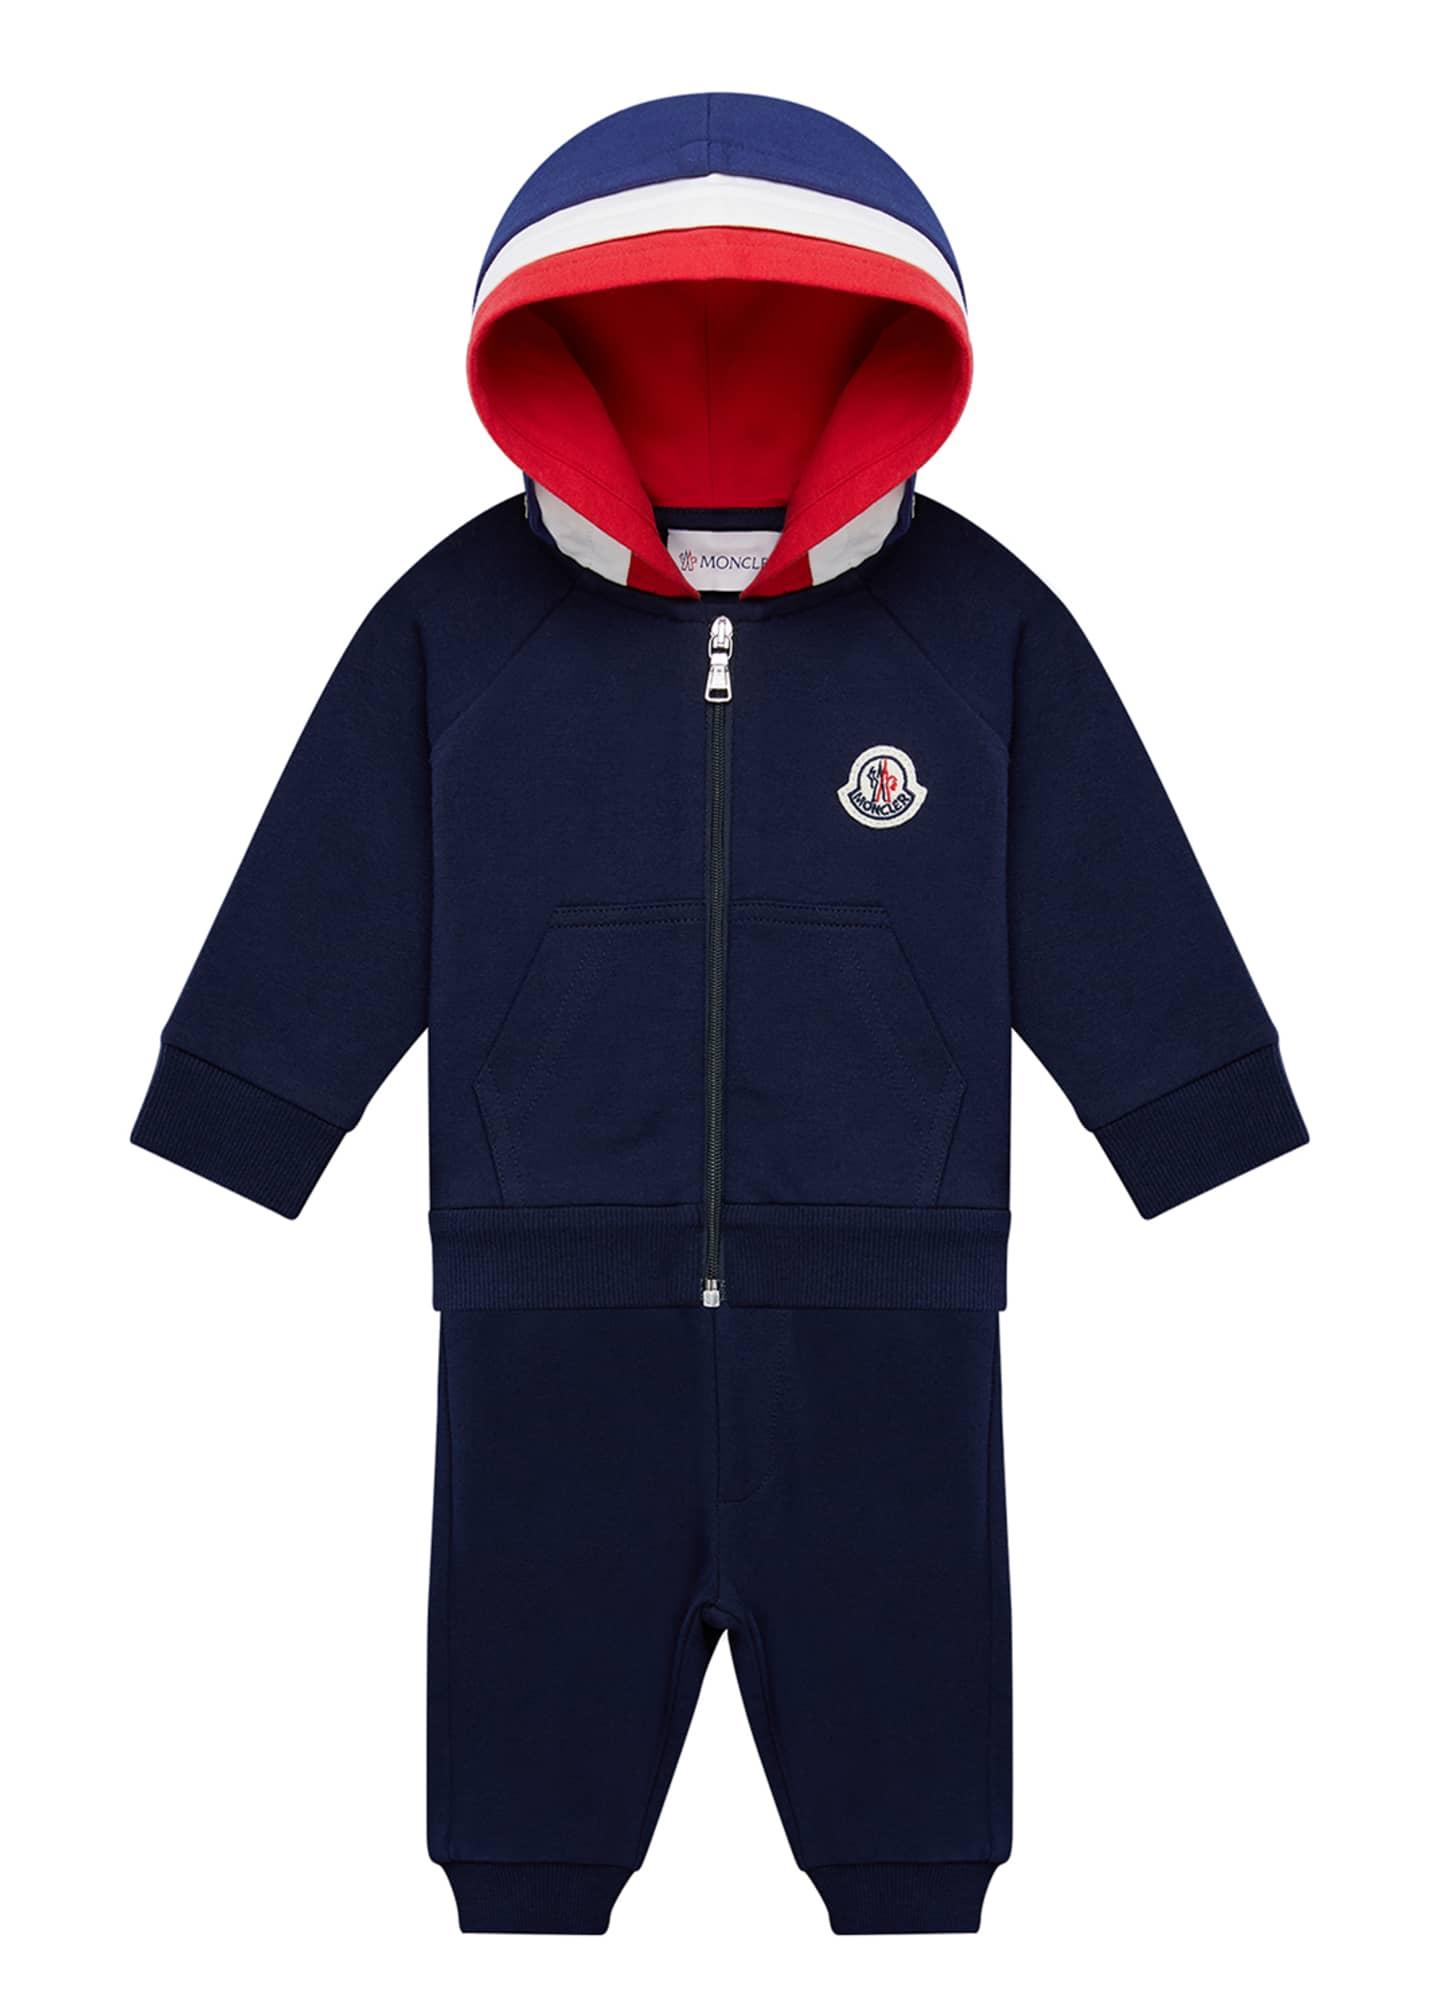 Moncler Boy's Molleton Hooded Jacket w/ Sweatpants, Size